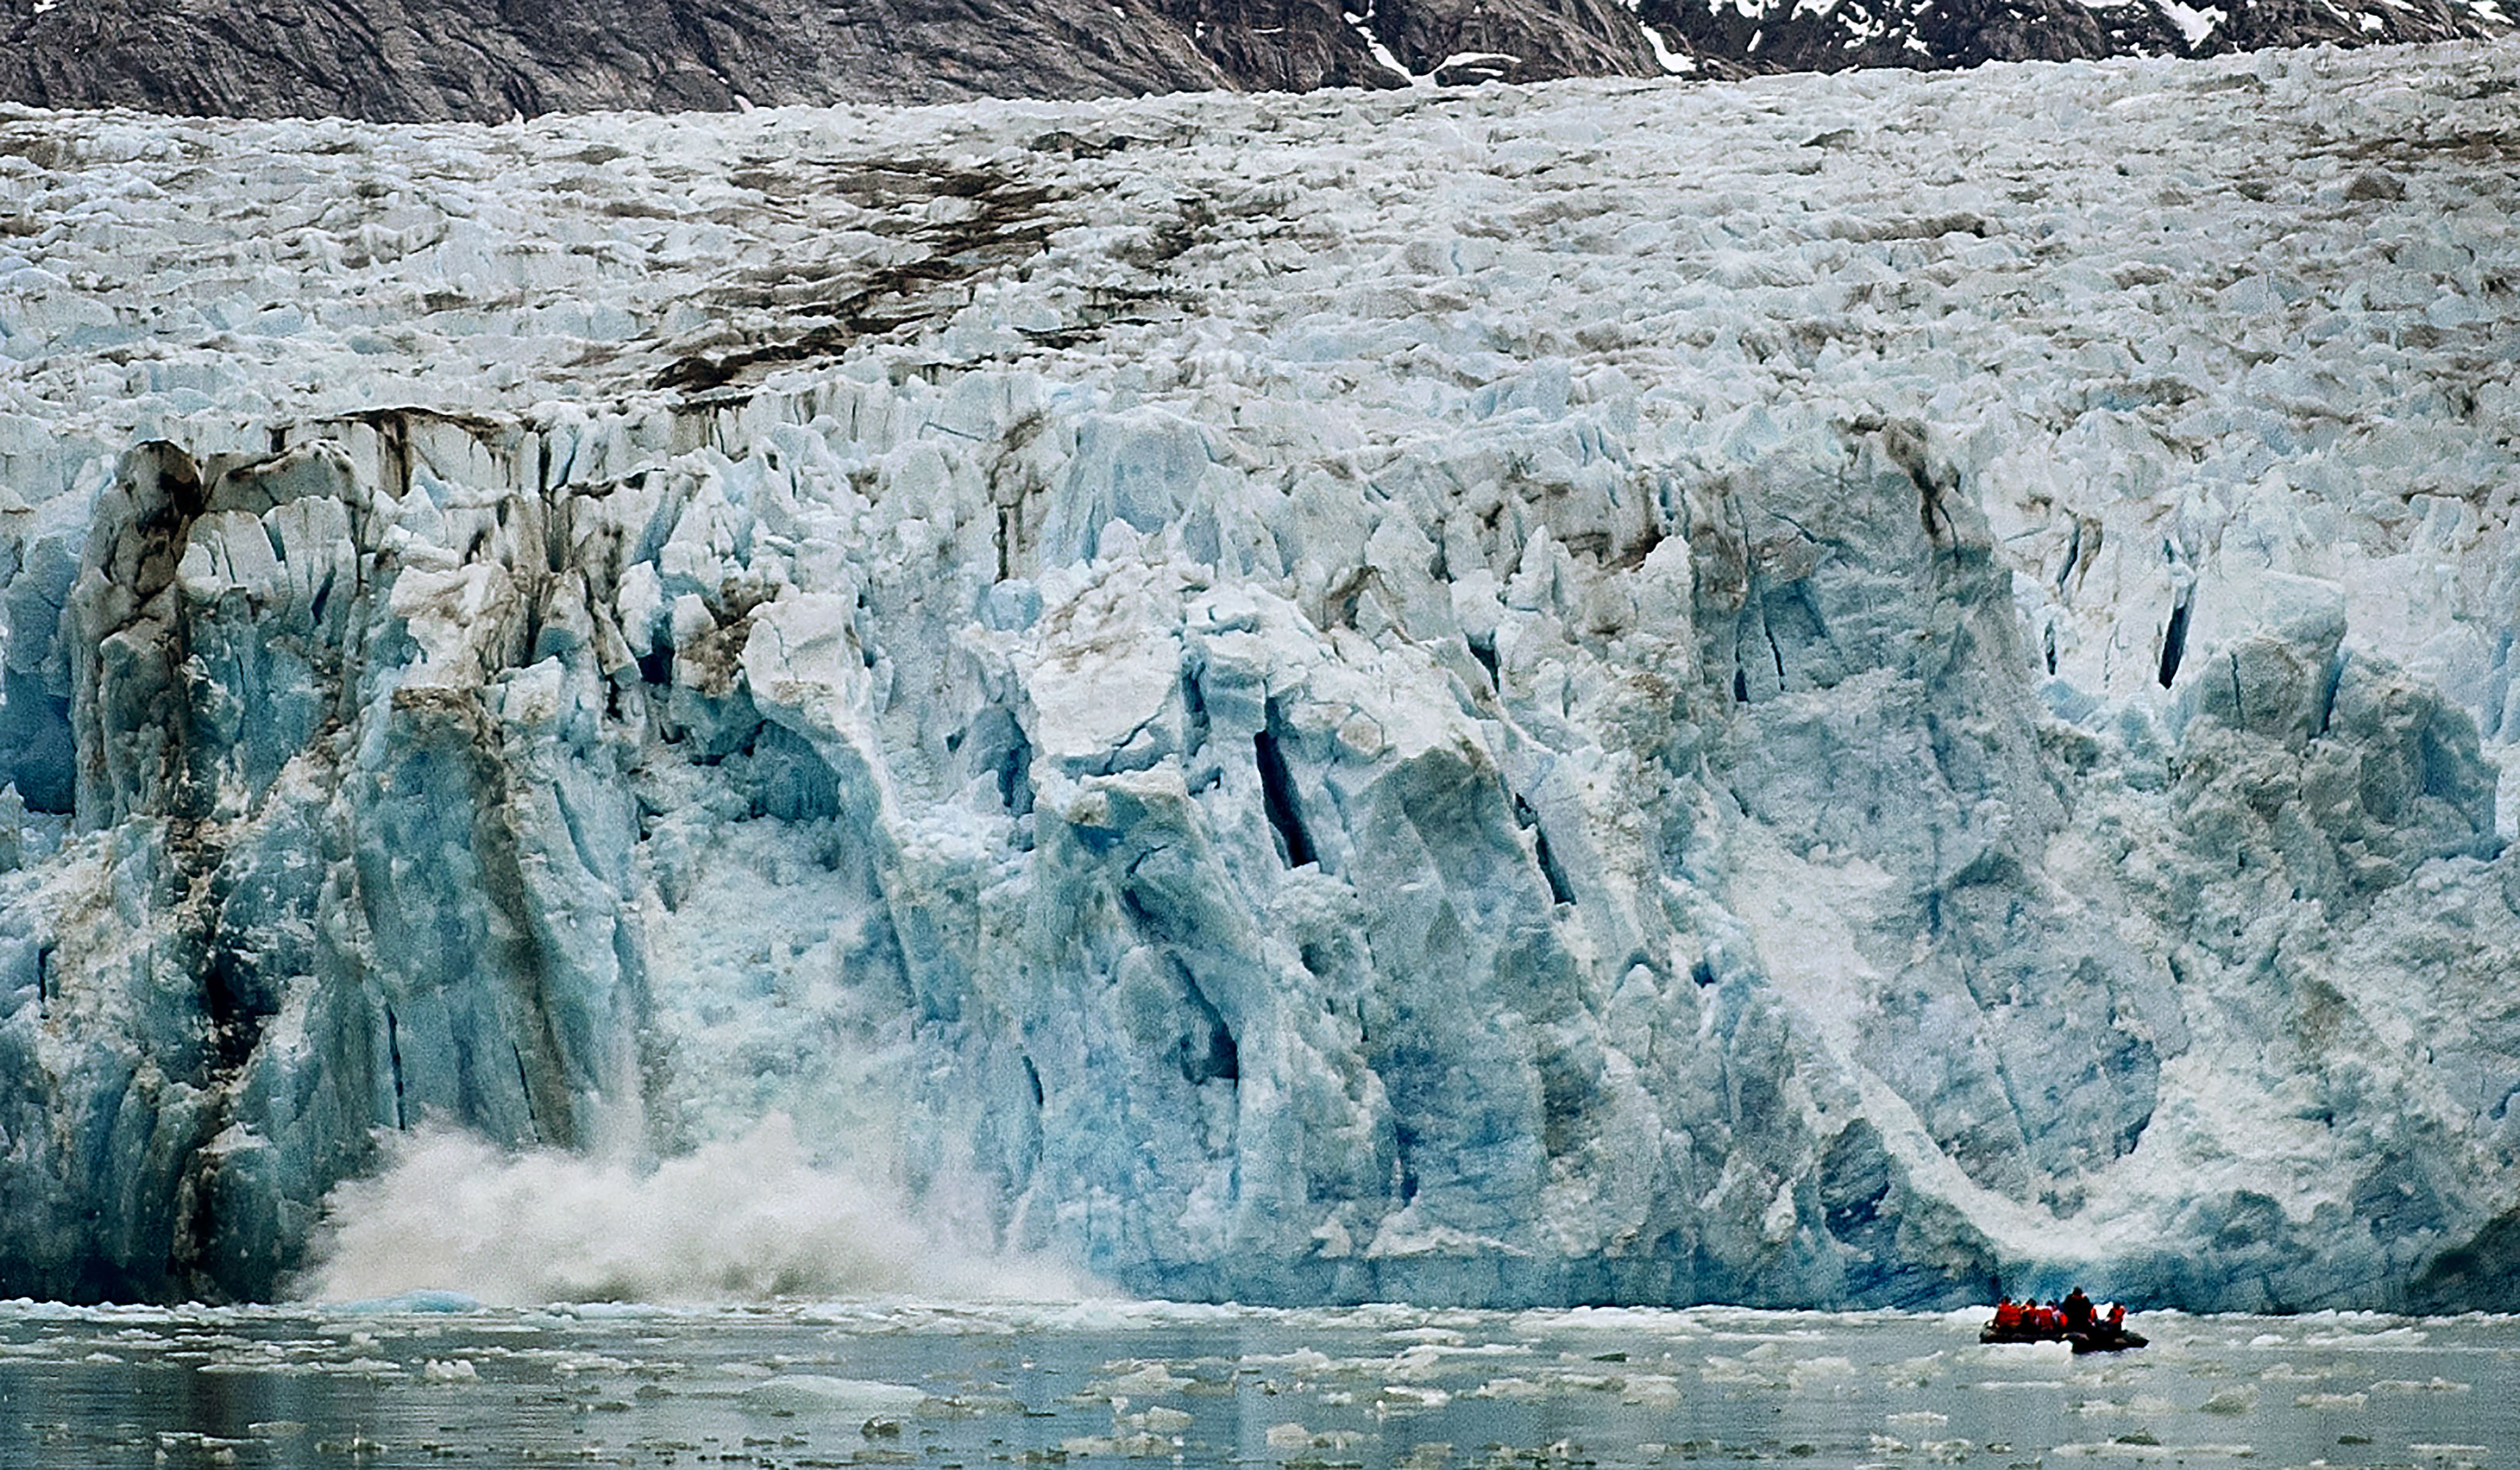 Dawes Glacier Calving again